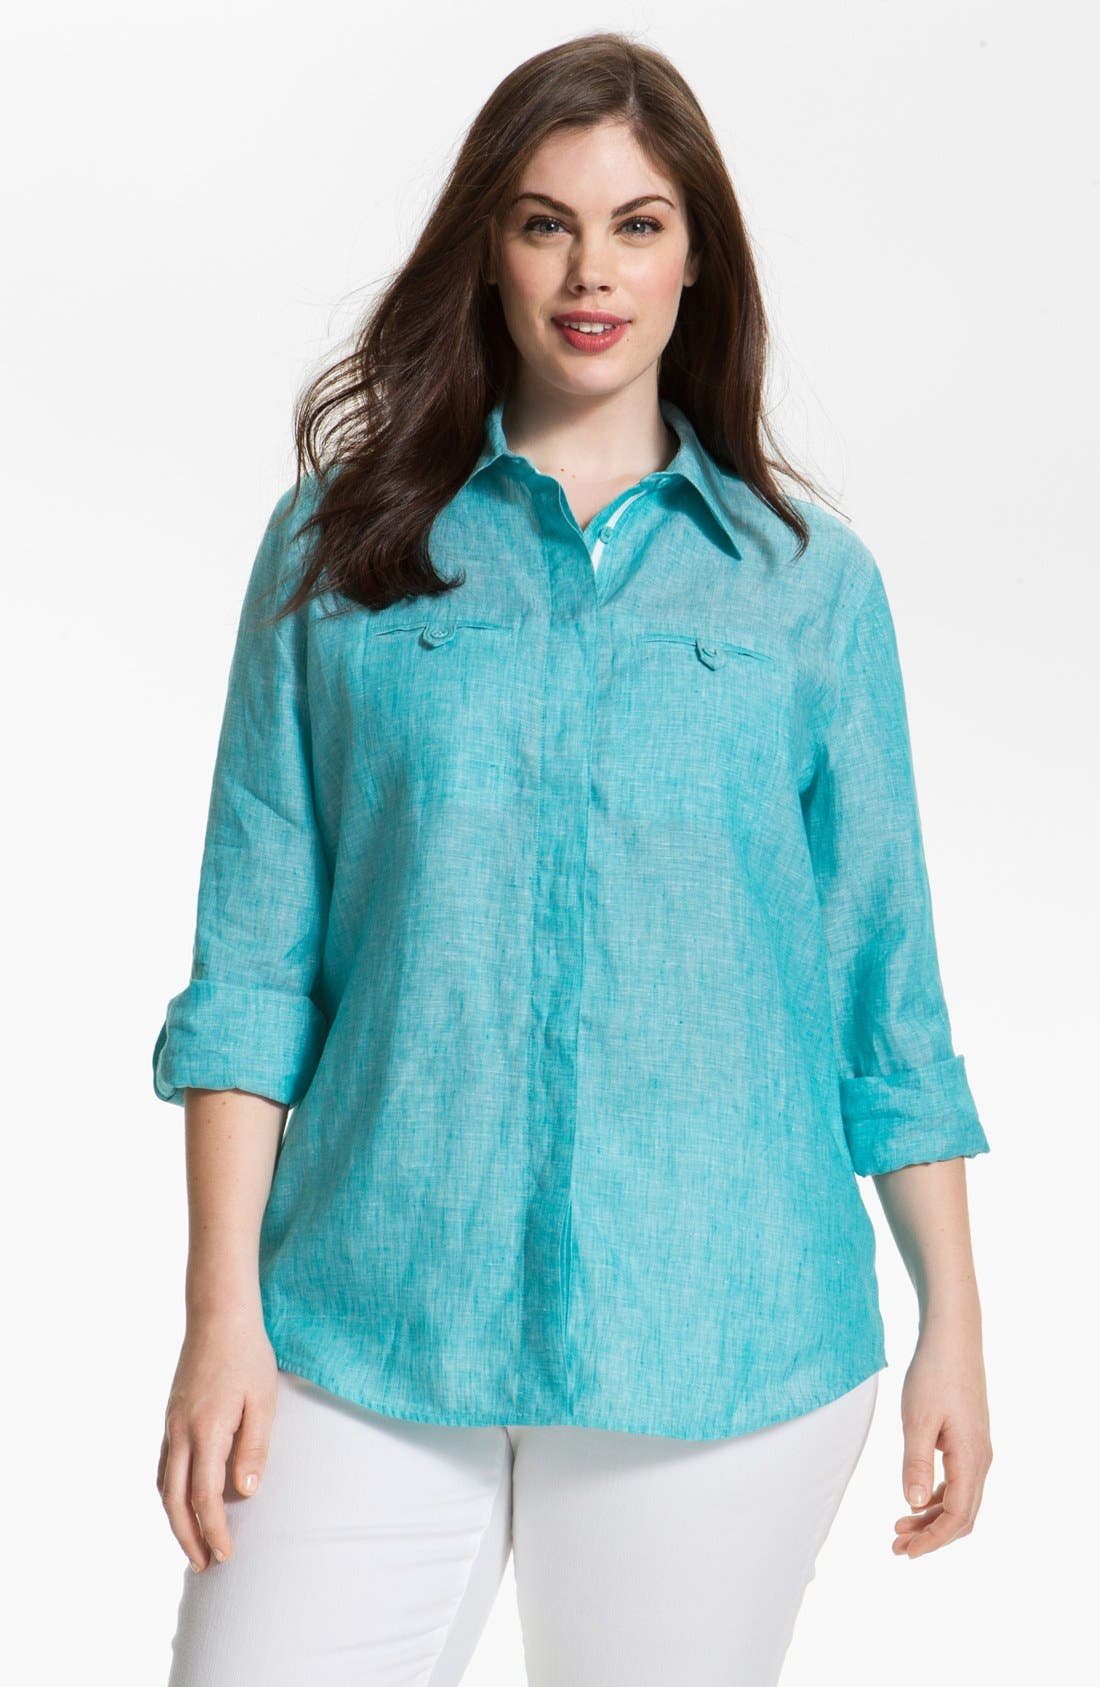 Alternate Image 1 Selected - Foxcroft Linen Shaped Shirt (Plus Size)